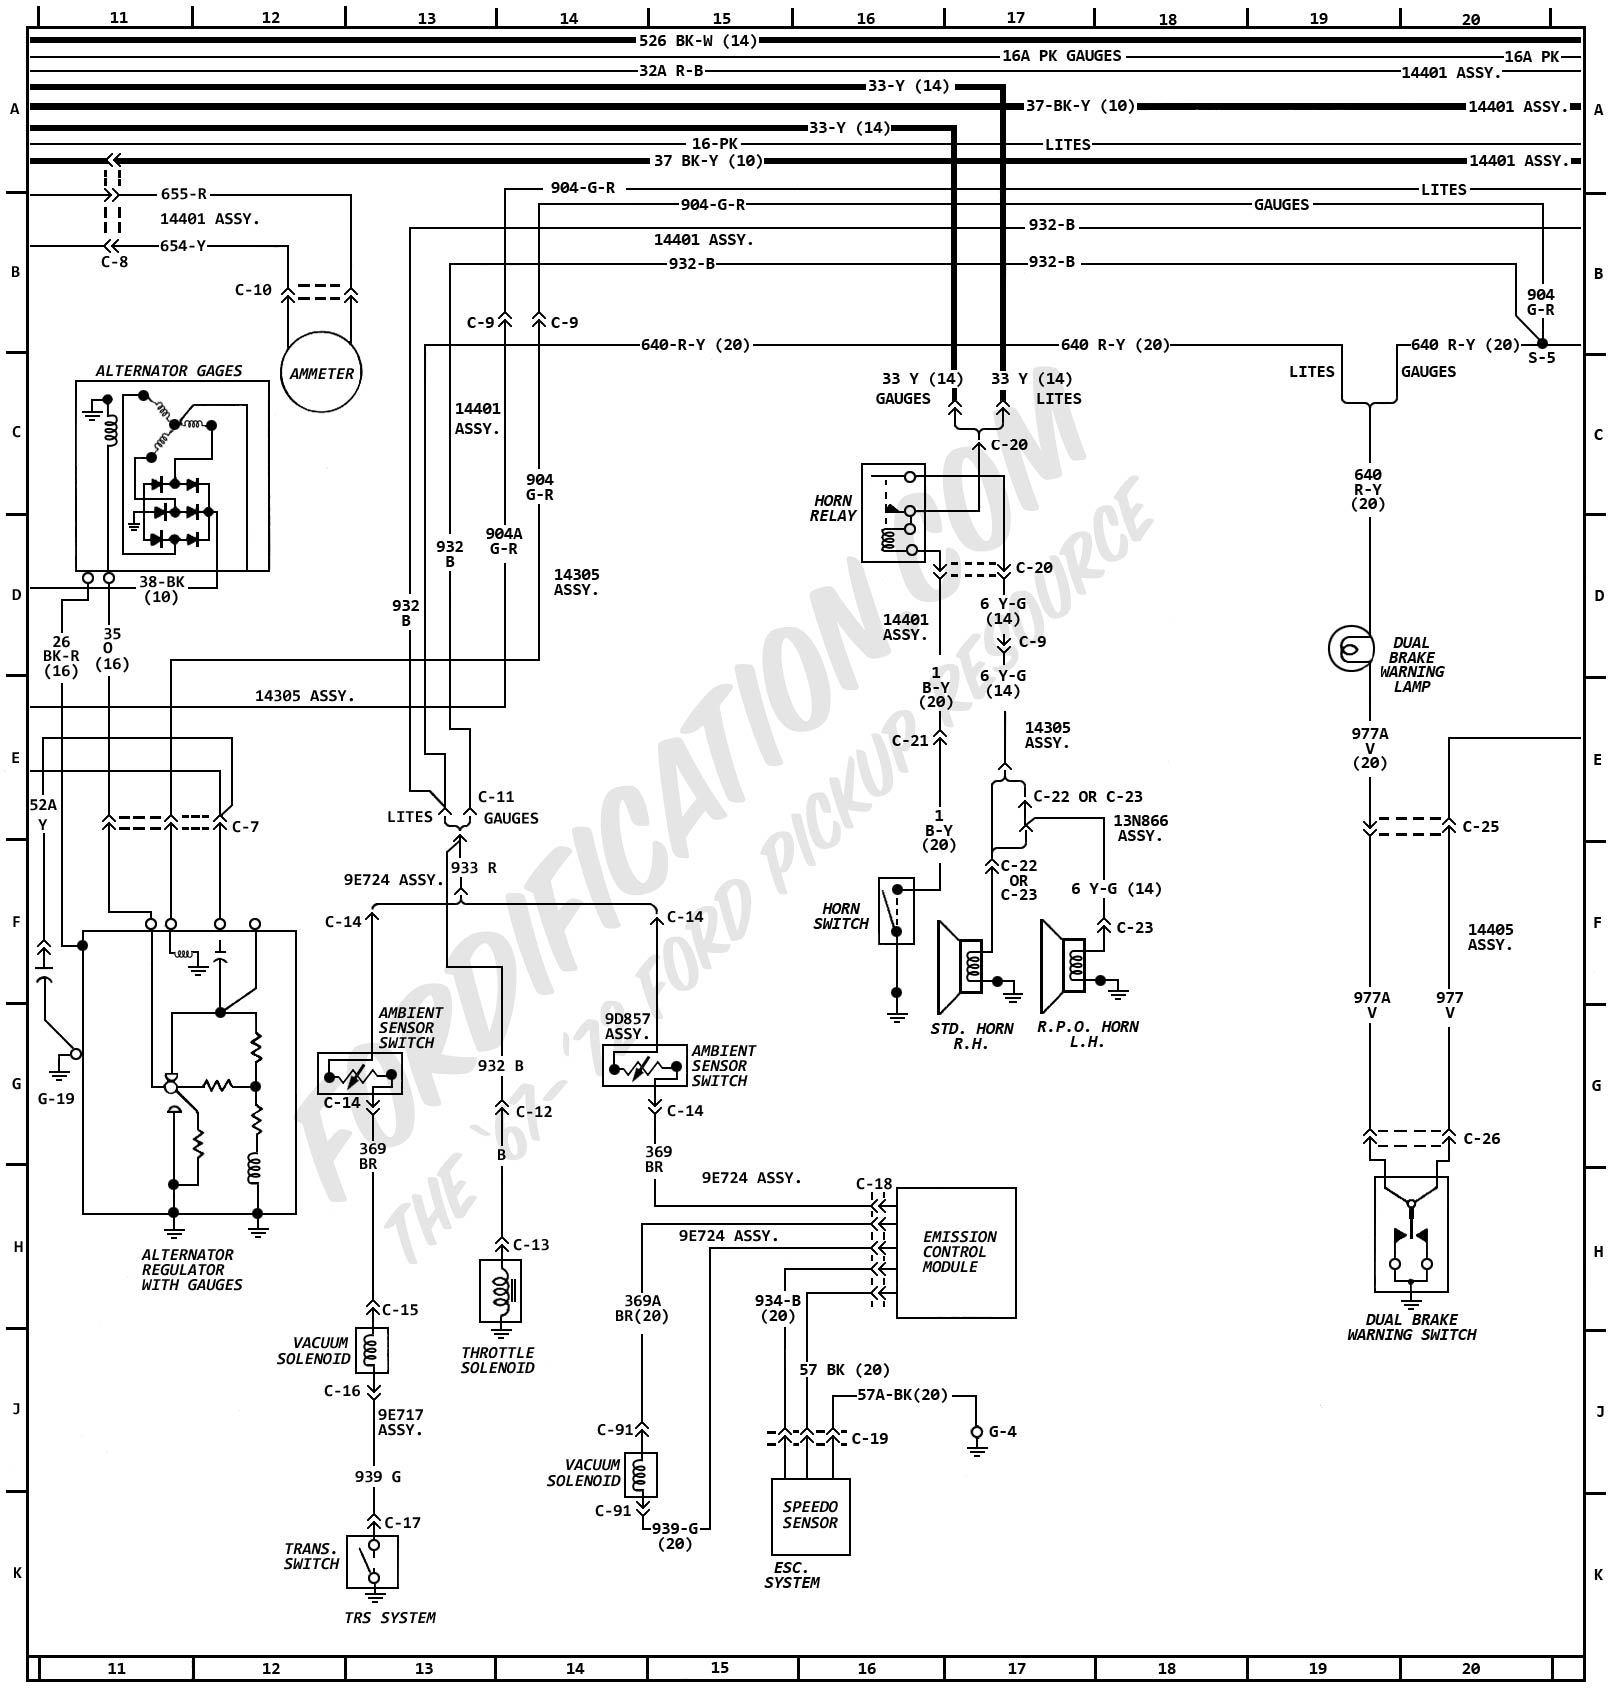 F250 Temp And Voltage Gauges